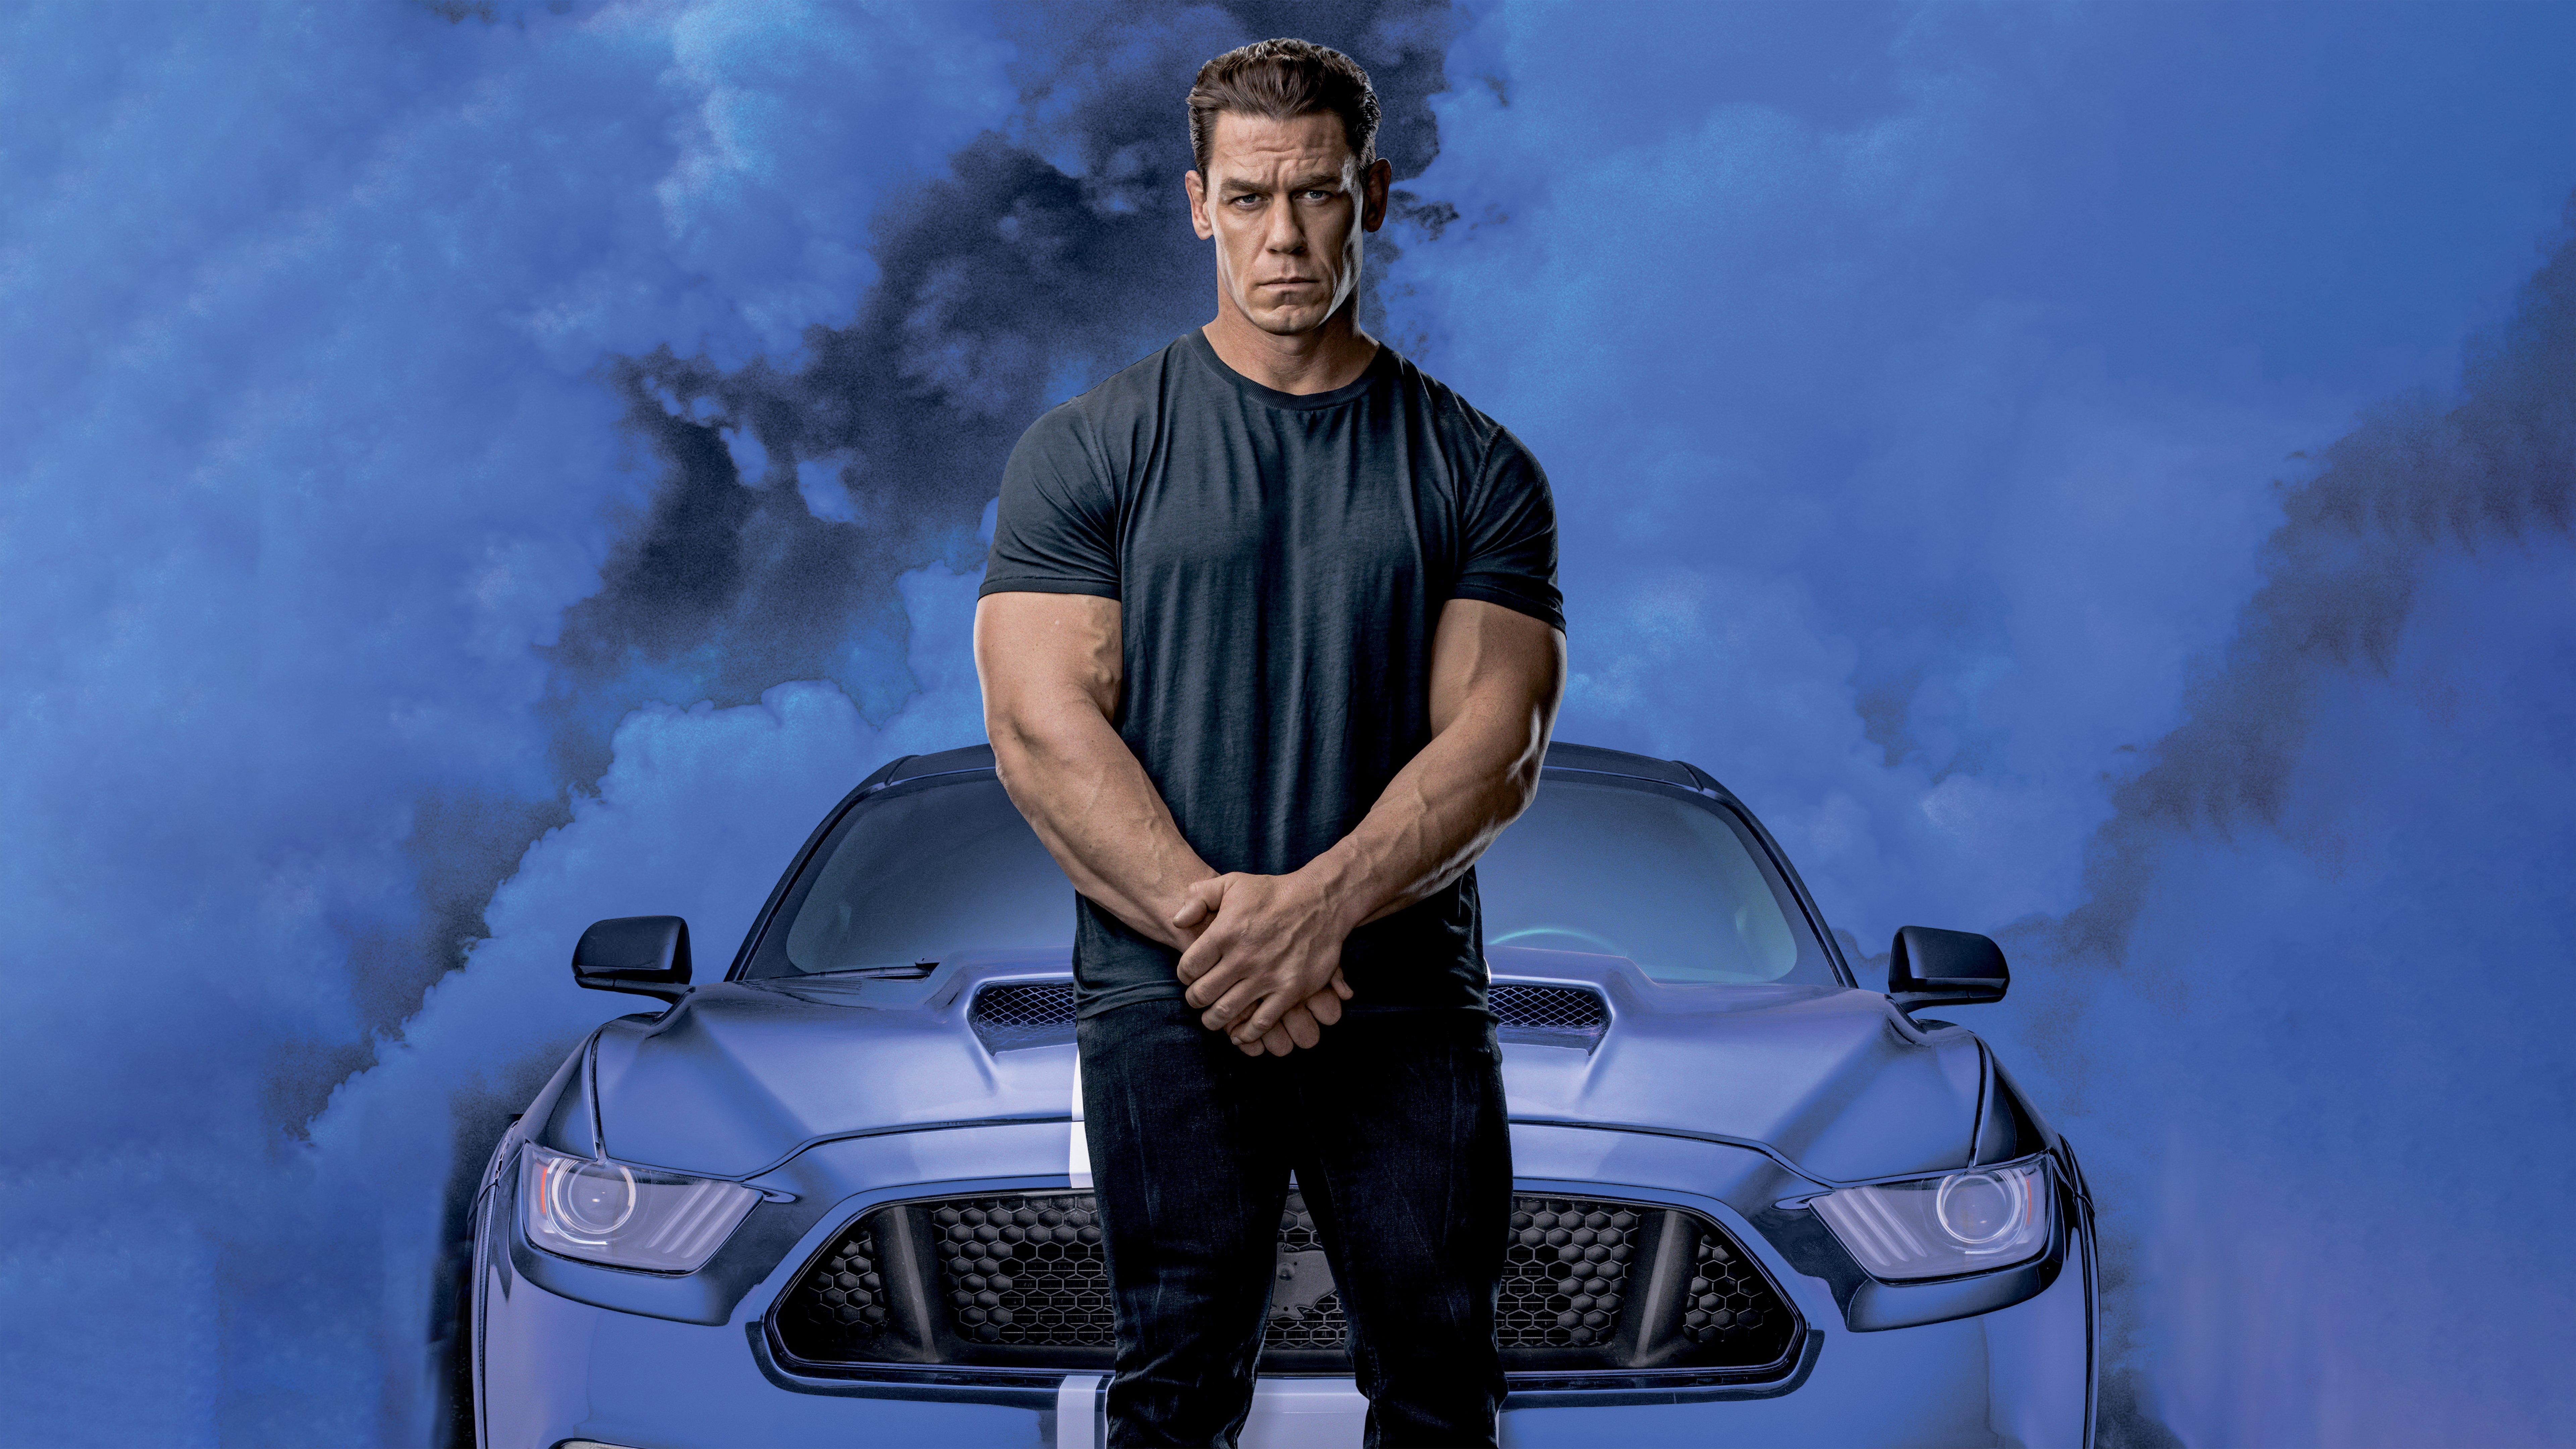 Fondos de pantalla John Cena Jakob Toretto en Rapidos y Furiosos 9